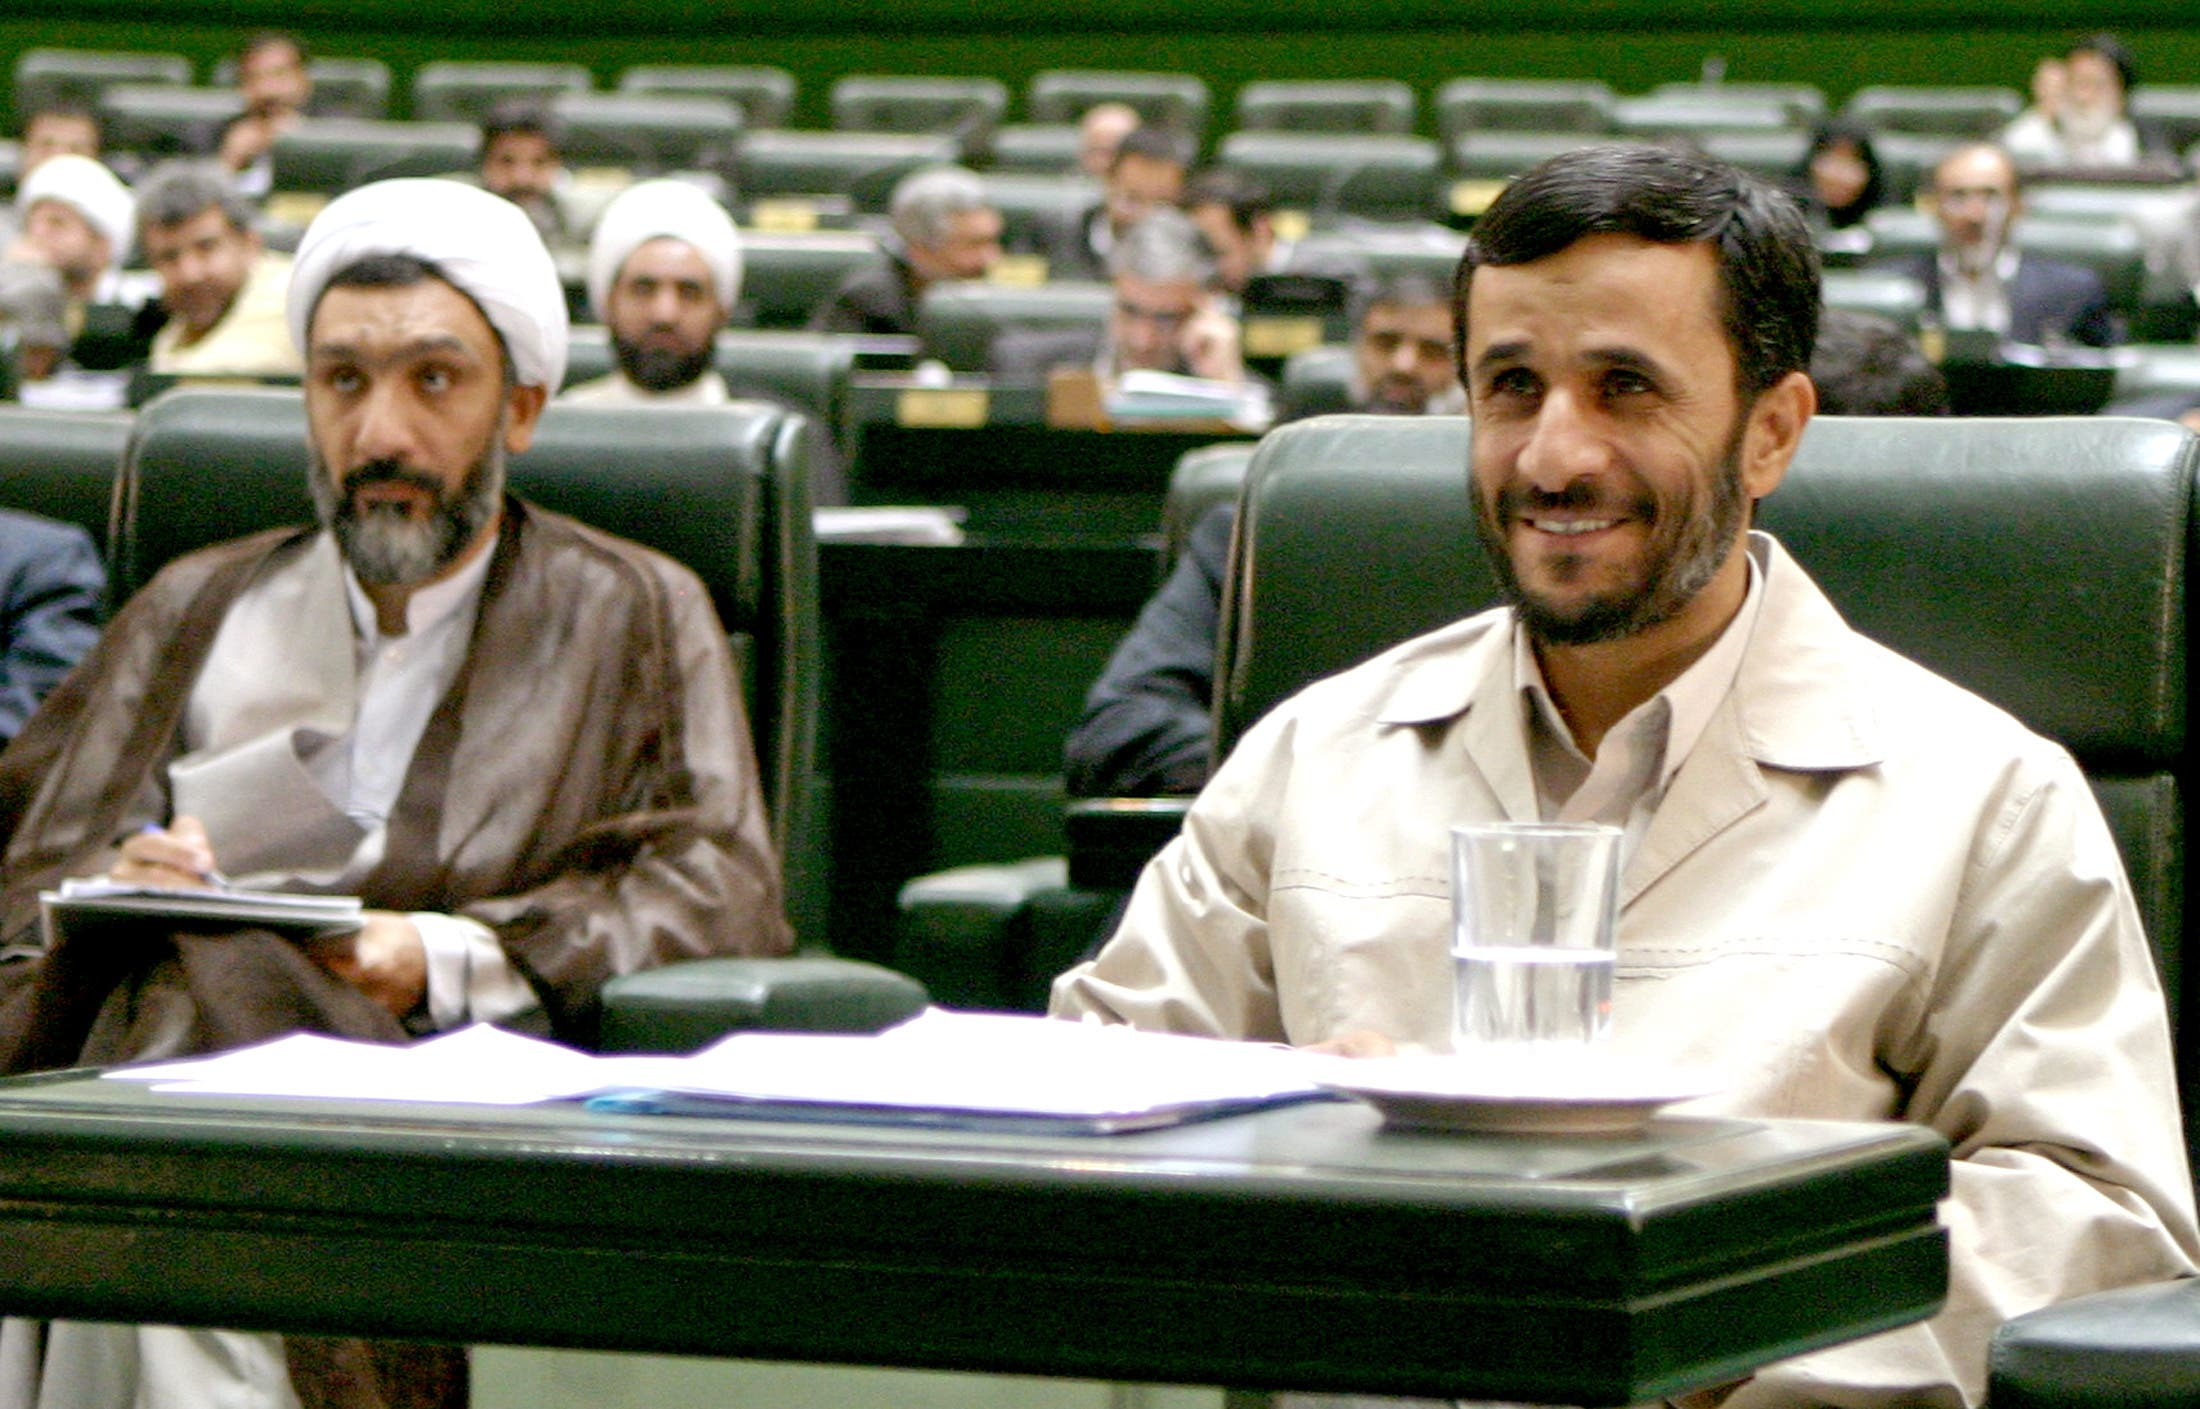 Mahmoud Ahmadinejad and the former Minister of Interior Mostafa Pourmohammadi. (File photo: Reuters)